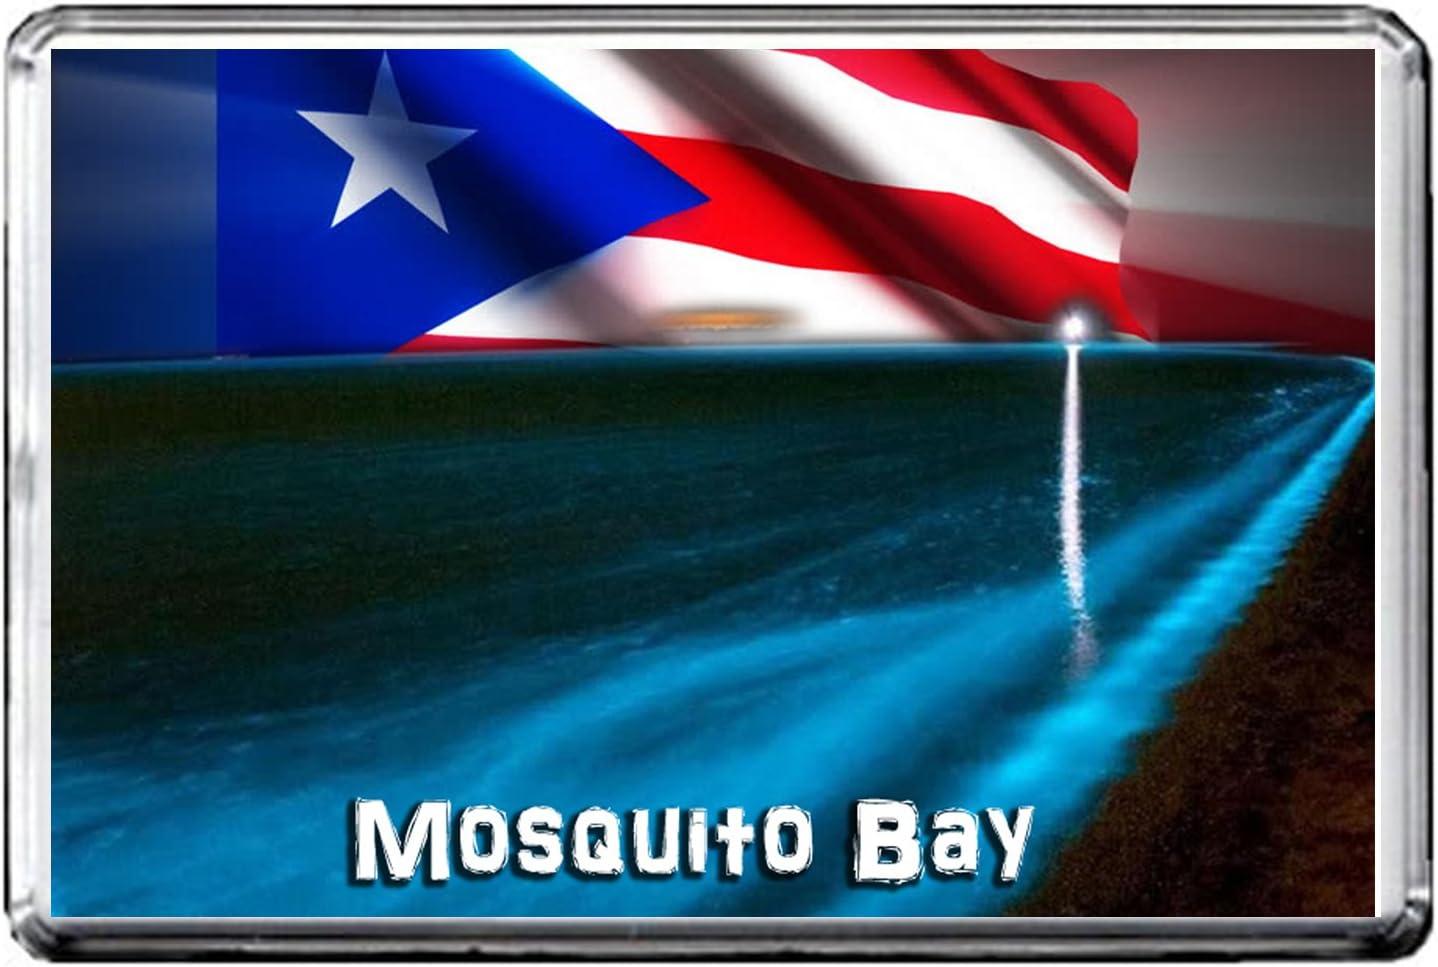 GIFTSCITY C236 MOSQUITO BAY FRIDGE MAGNET PUERTO RICO TRAVEL REFRIGERATOR MAGNET